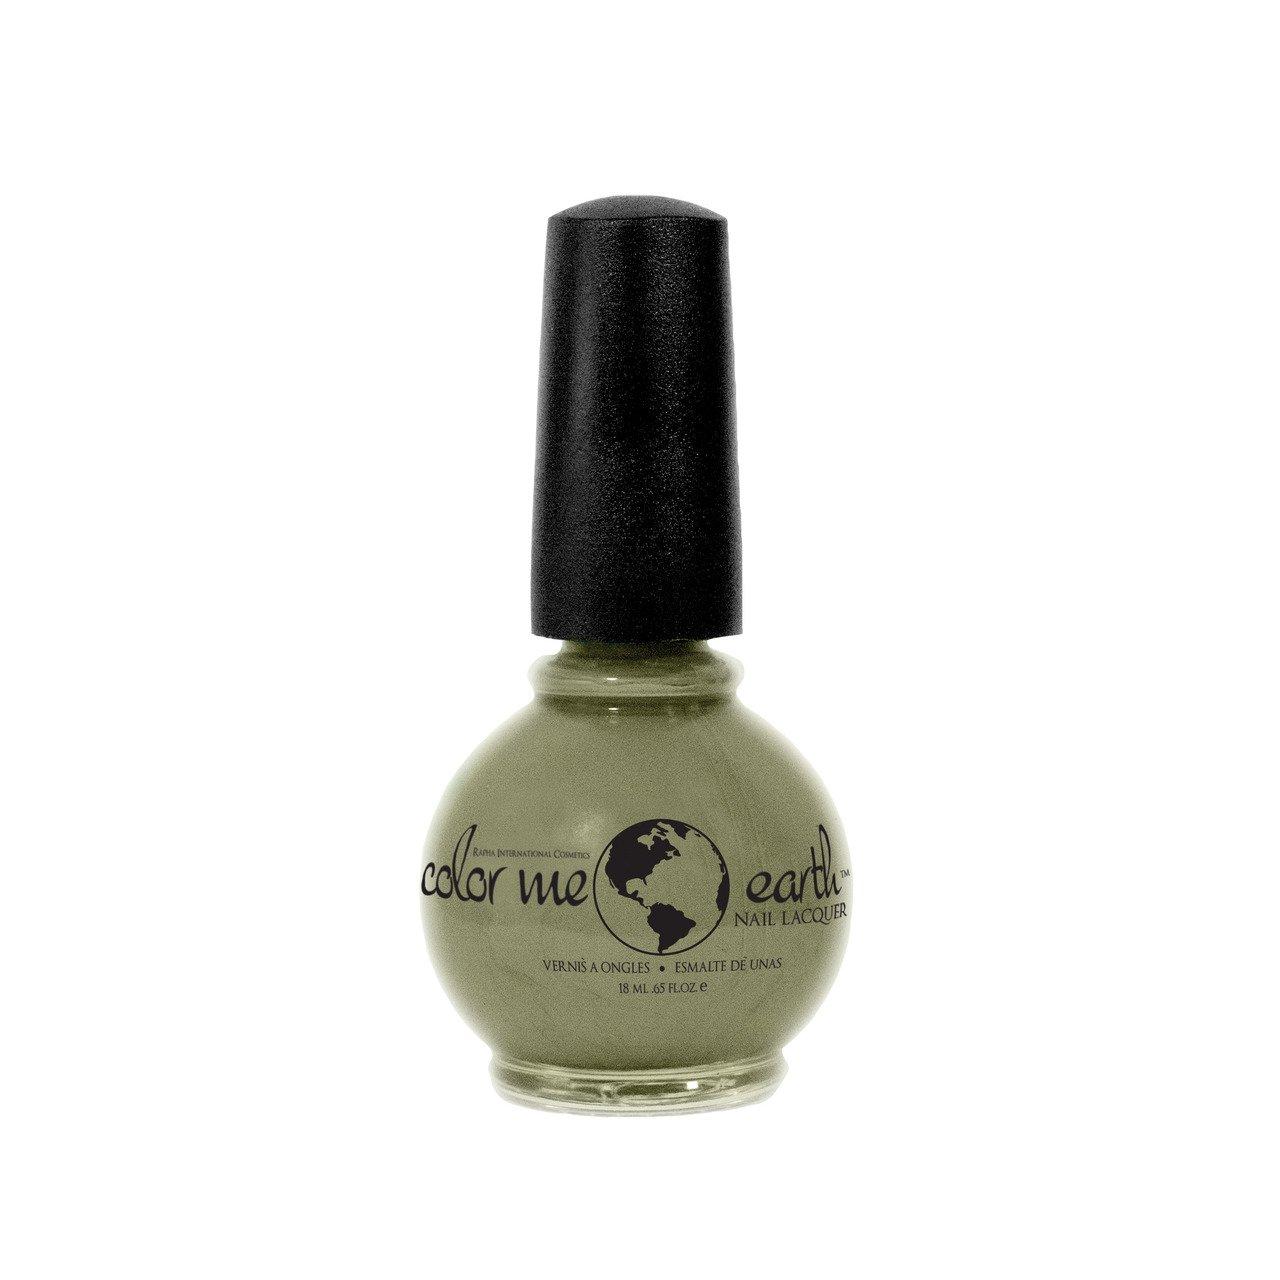 Amazon.com : Color Me Earth Nail Polish--Wet Sand--Beige Neutral ...